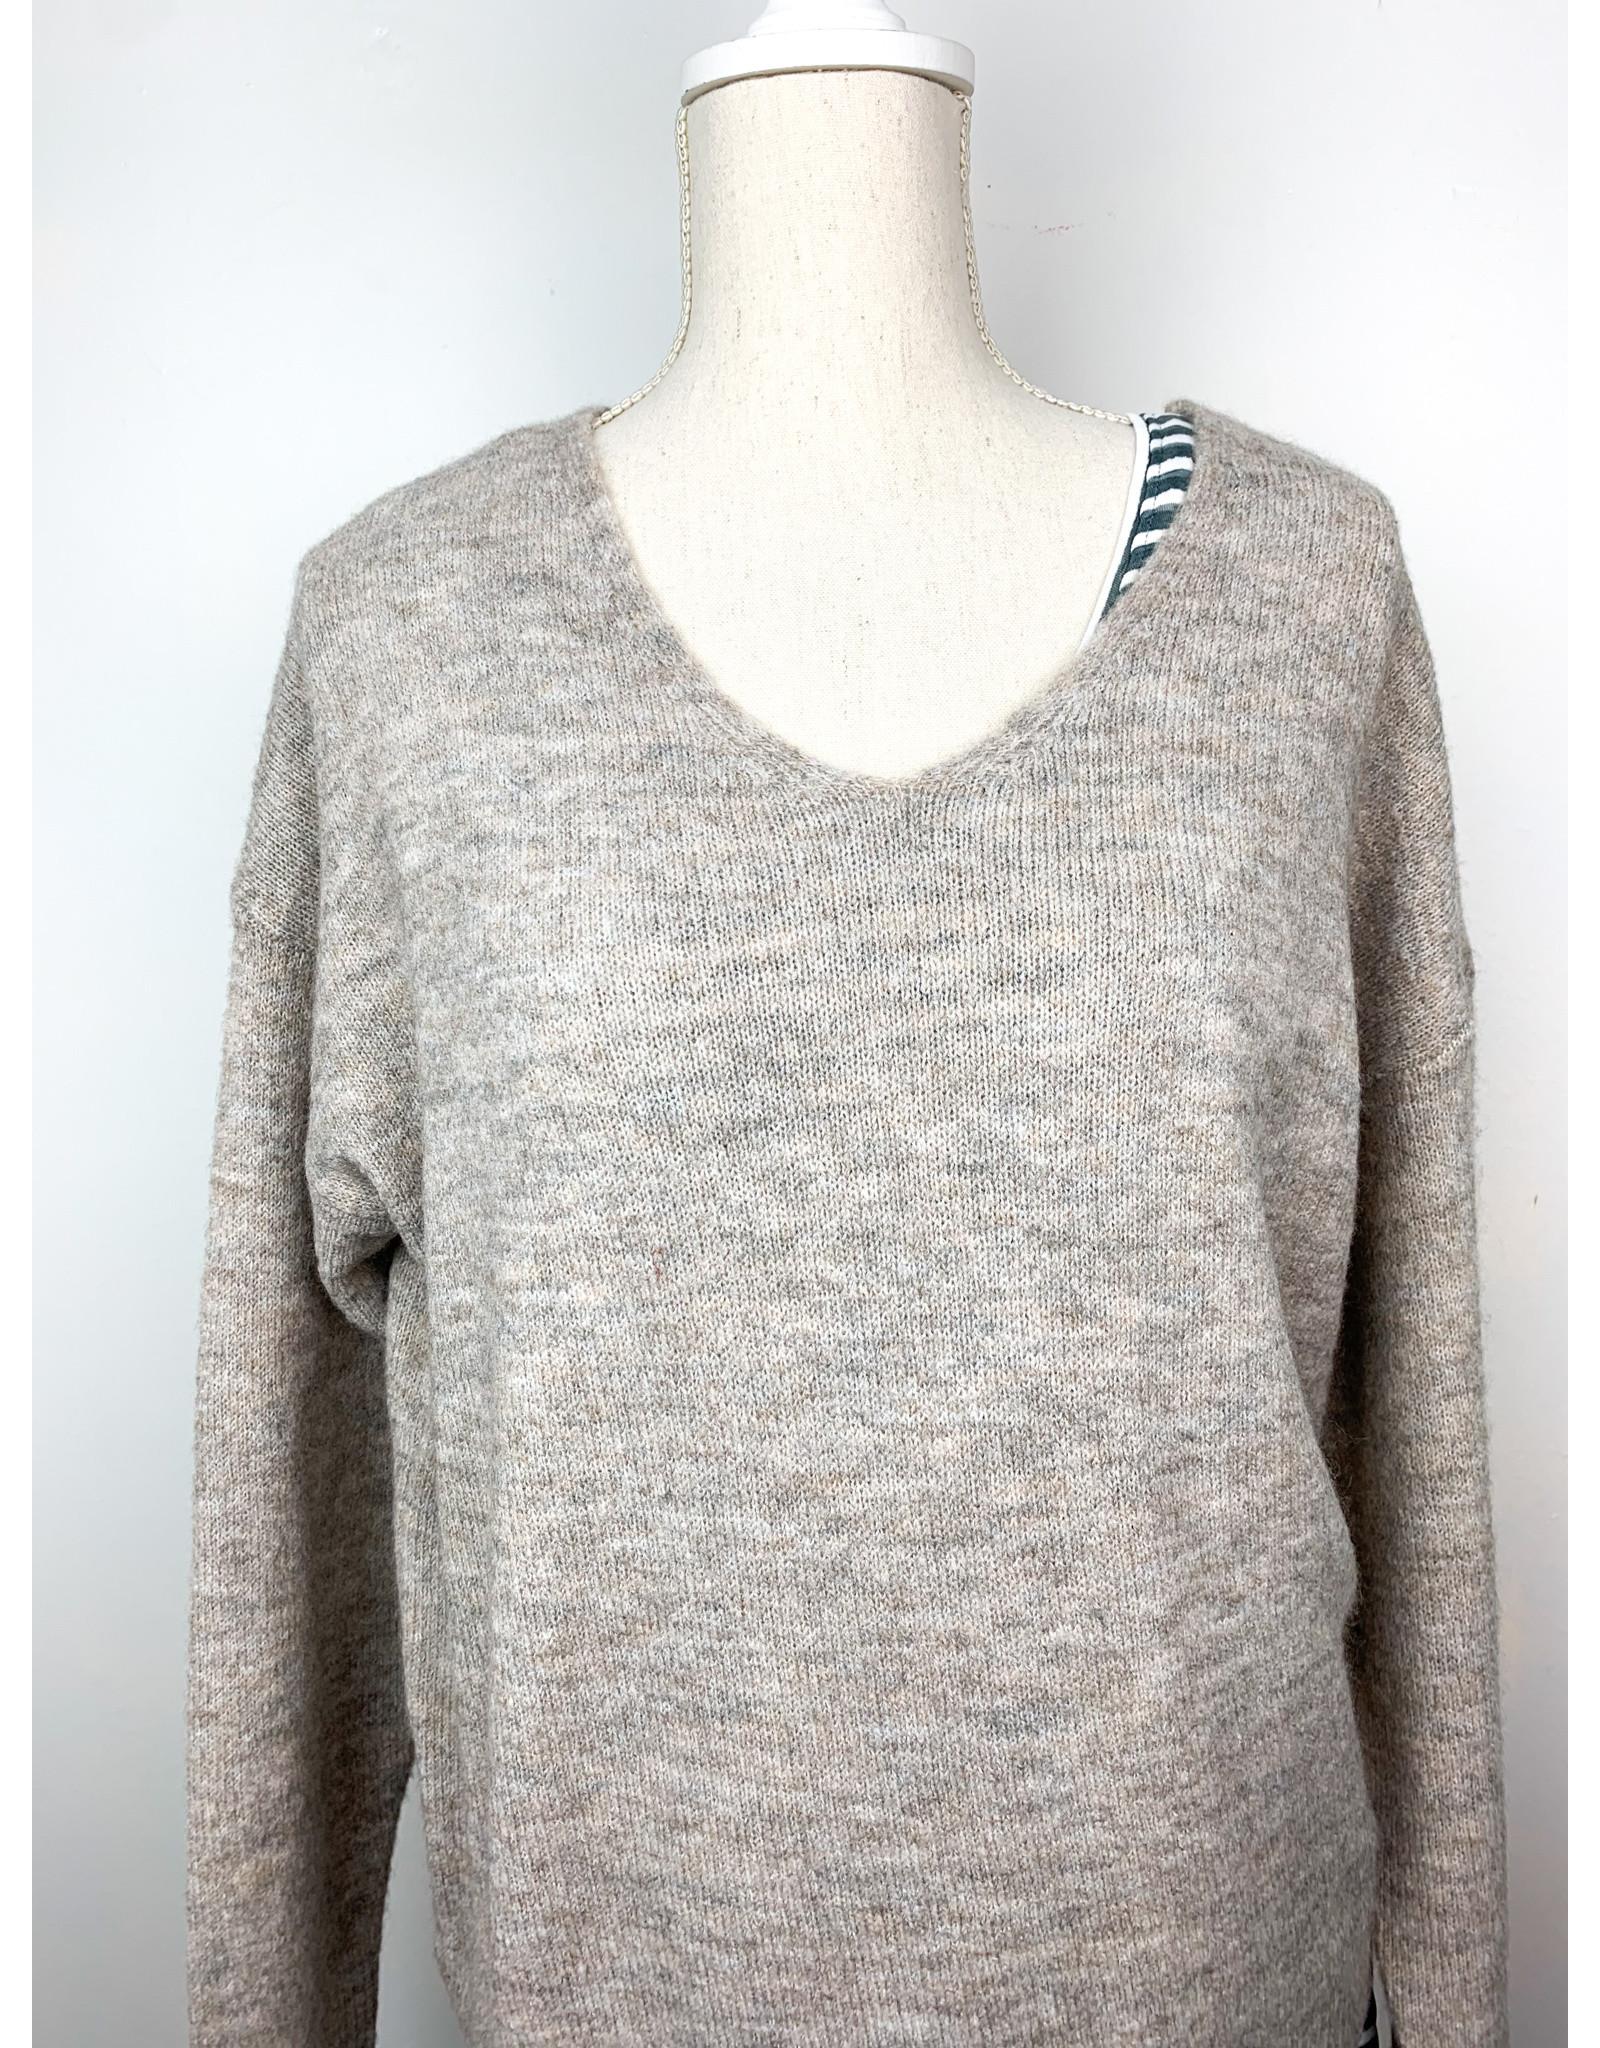 New Prospects Beige sweater